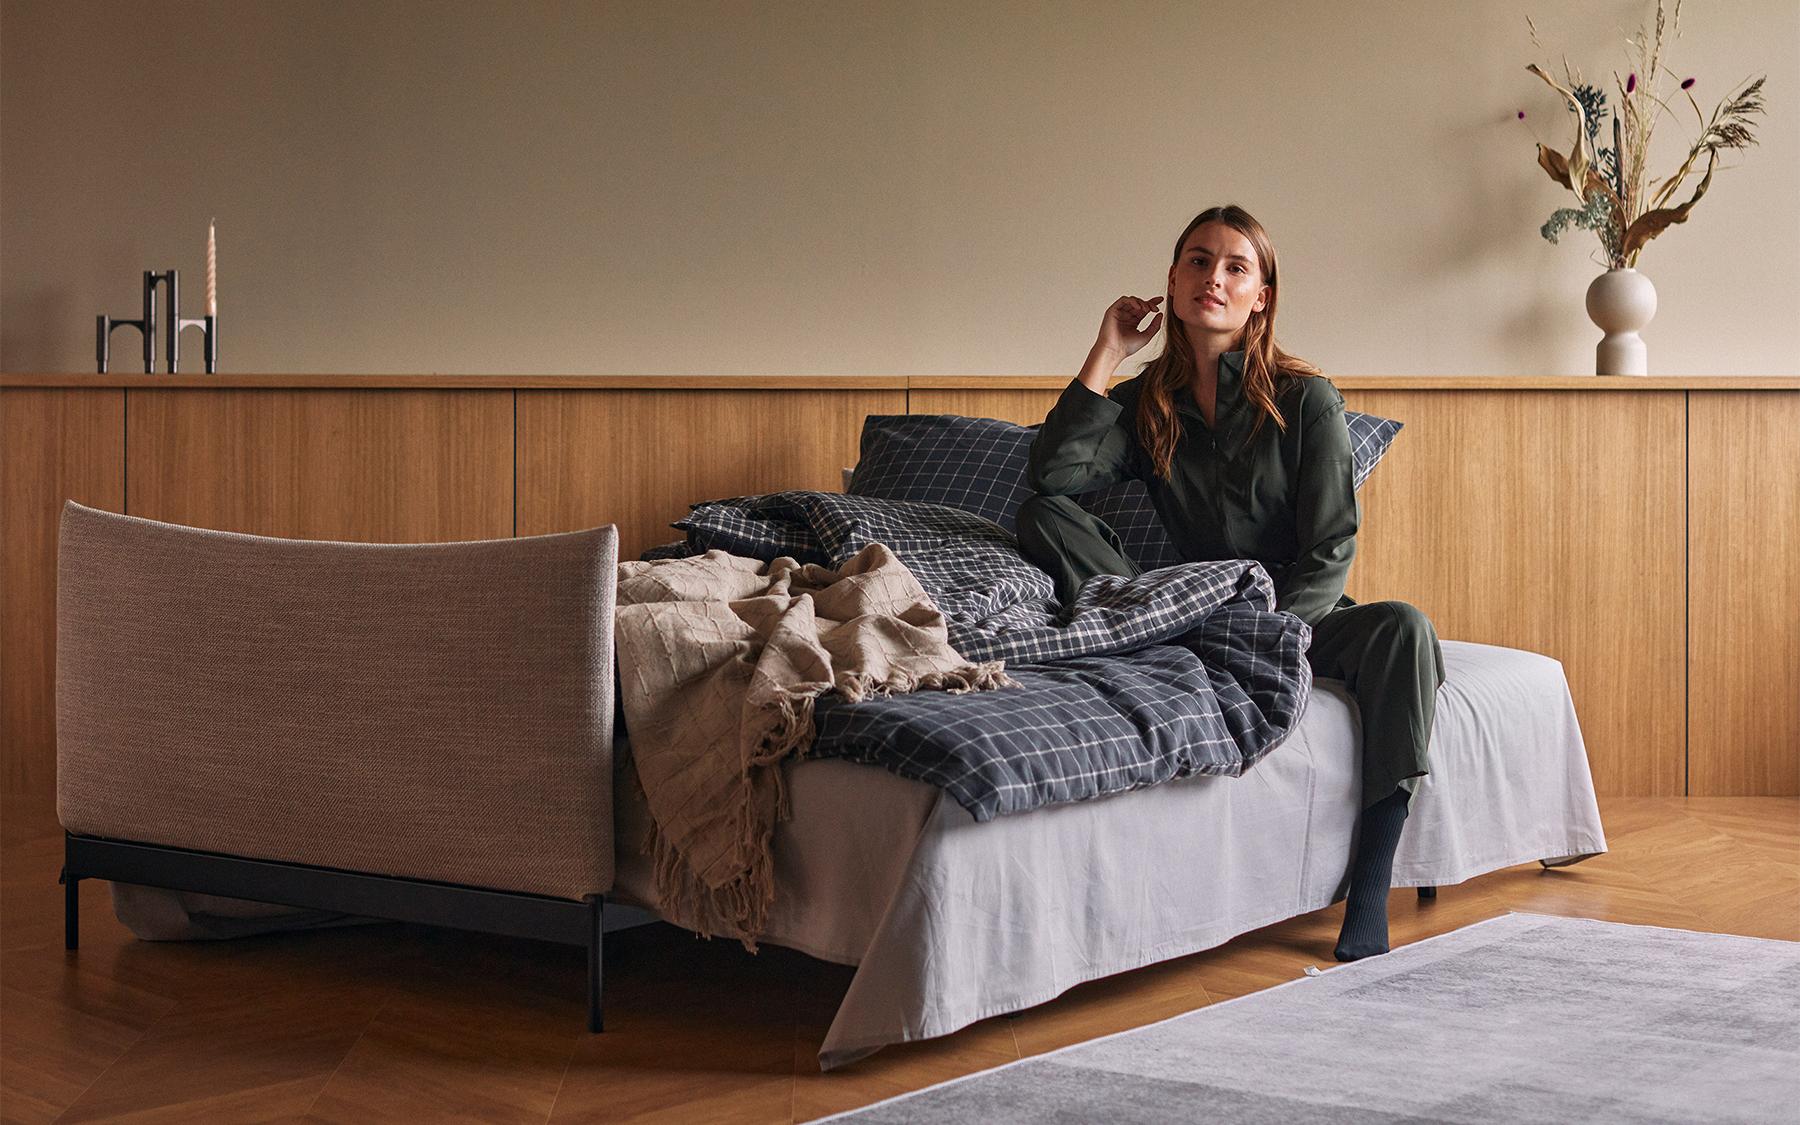 media/image/Malloy-Sofa-Bed-579-e7-web.jpg